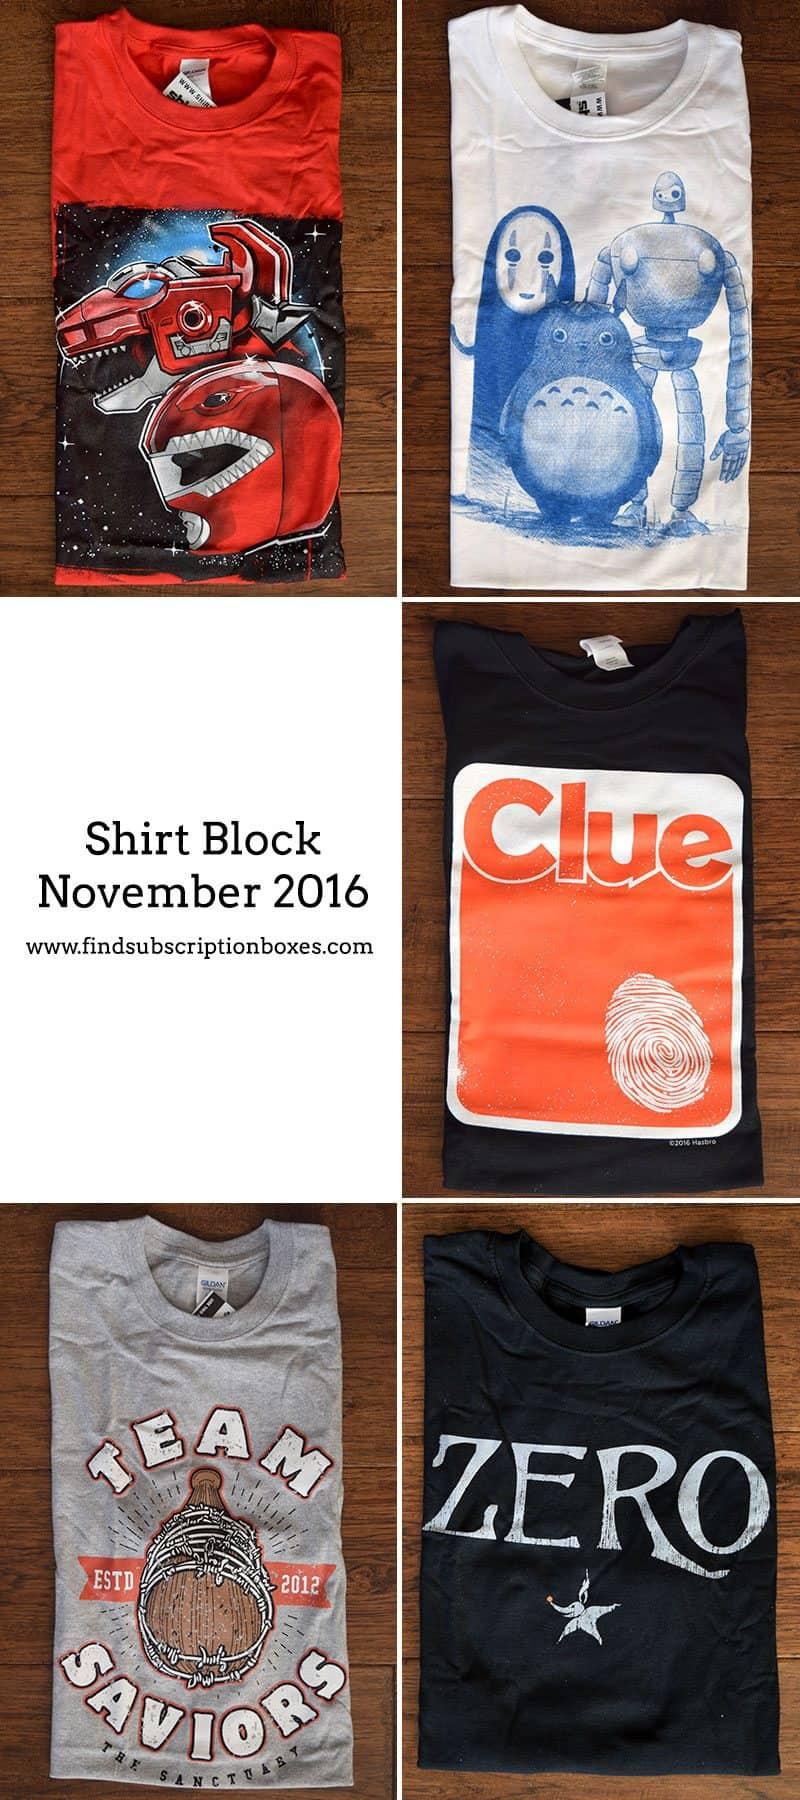 November 2016 Shirt Block Review - Inside the Box